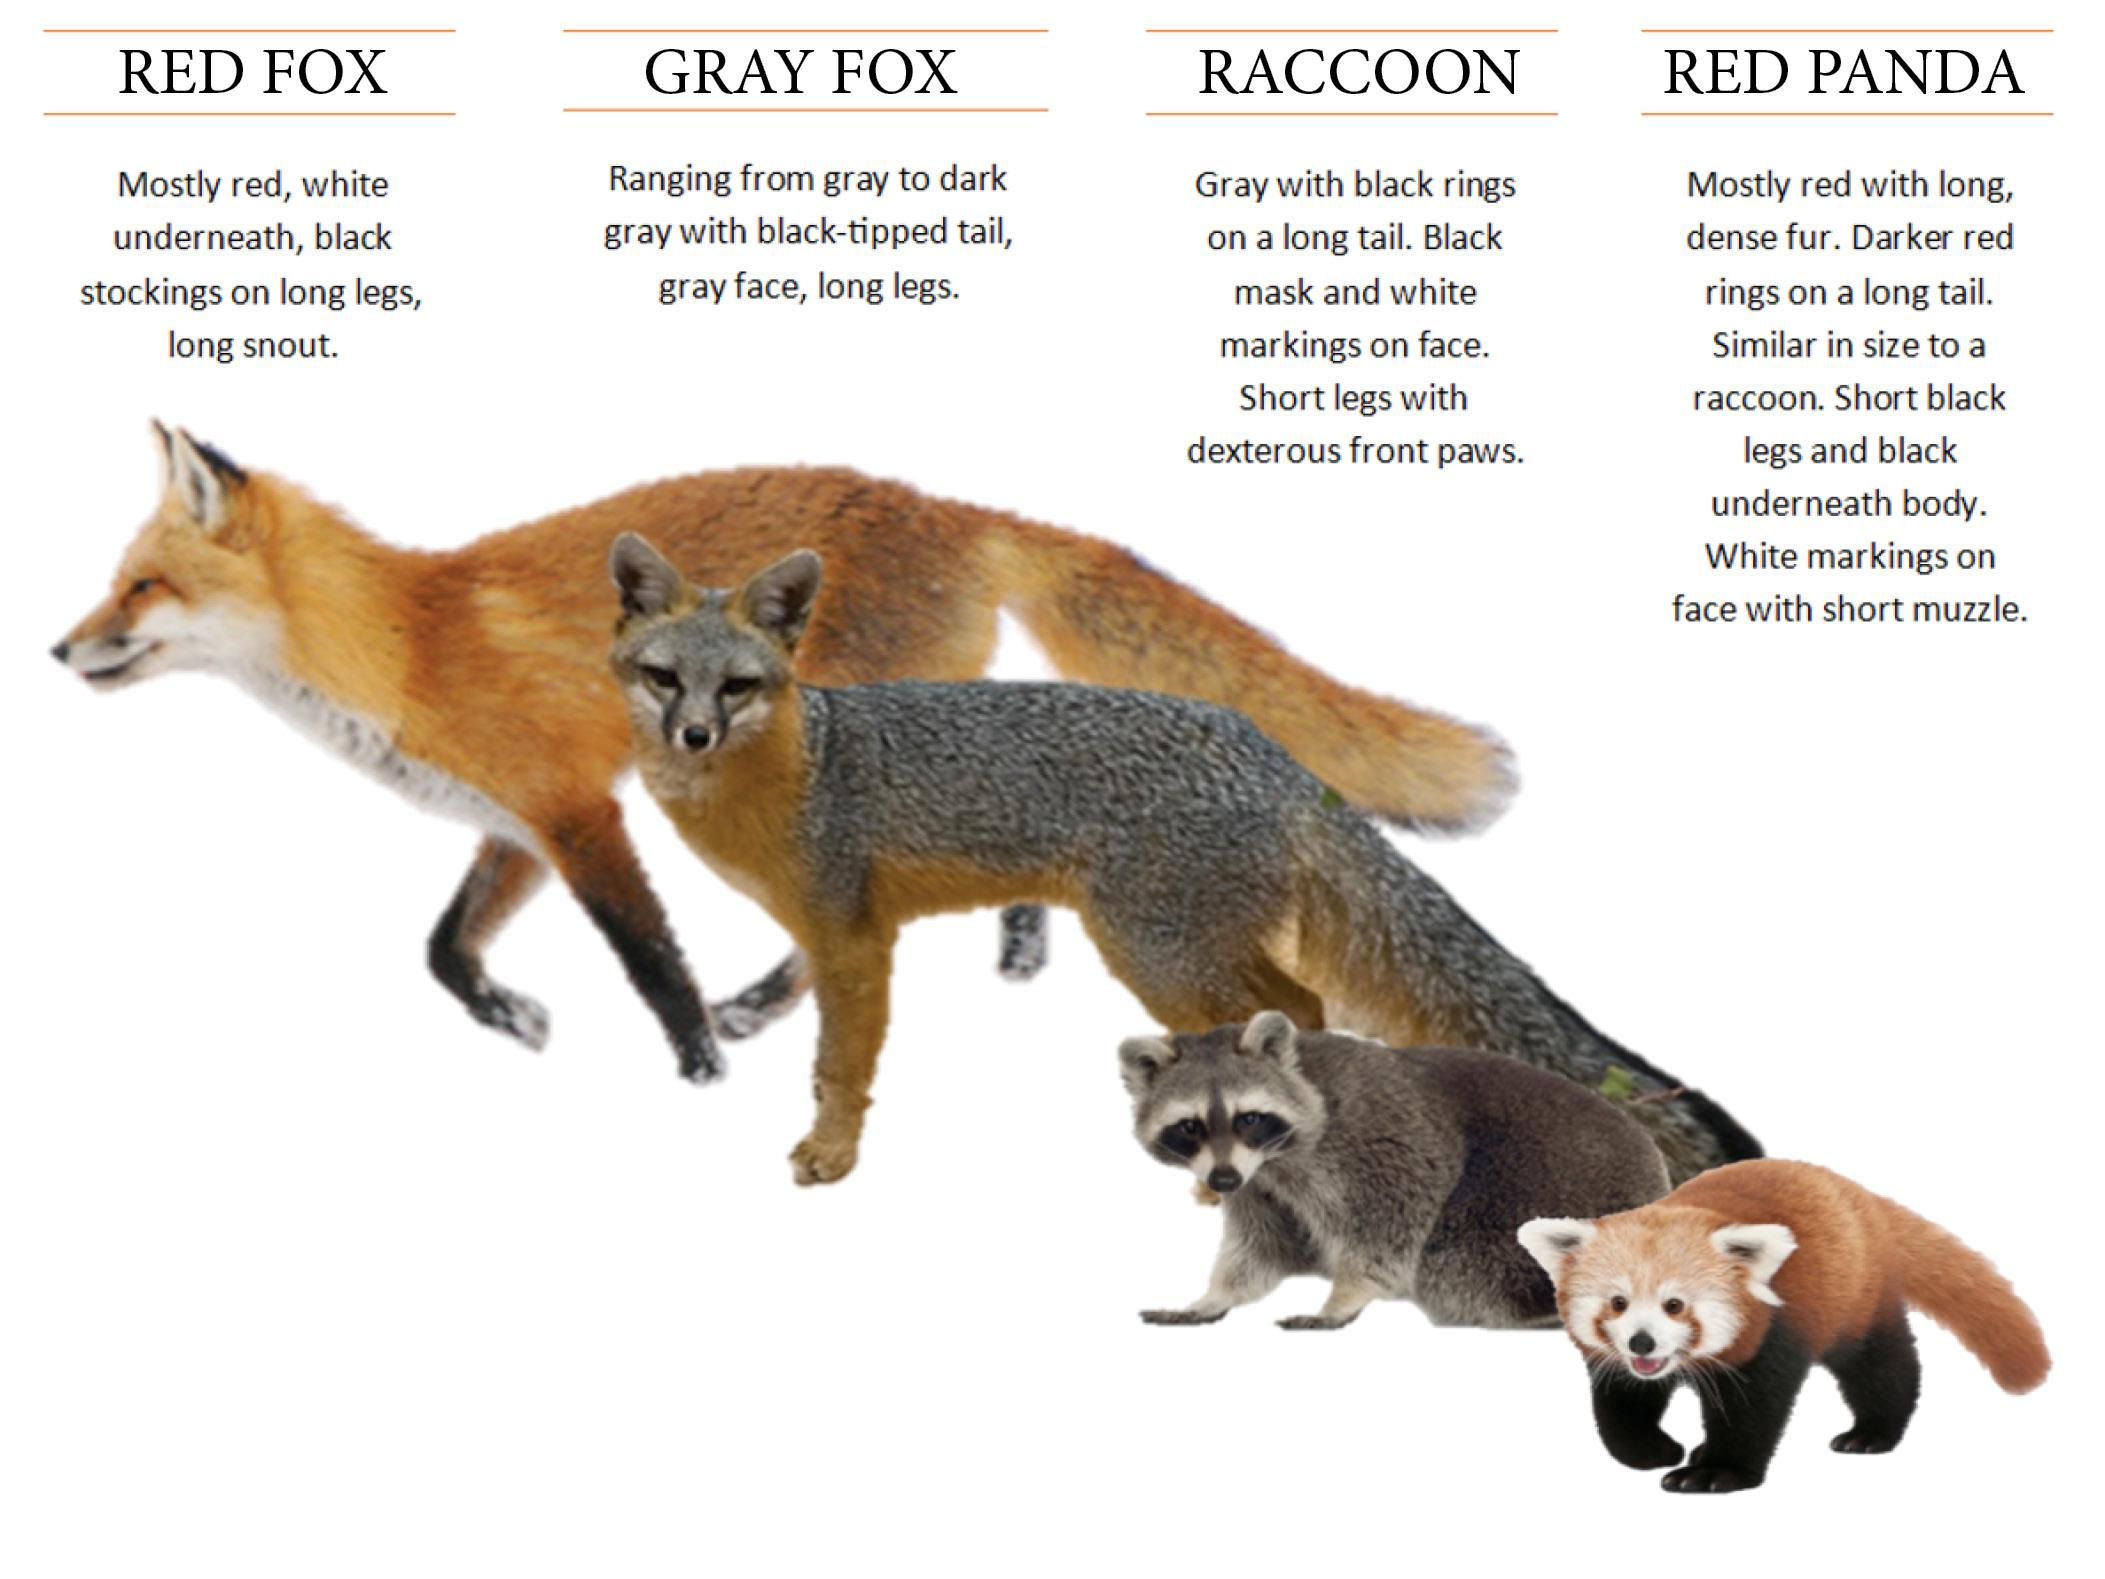 Virginia Zoo Red Panda Is Missing From Habitat